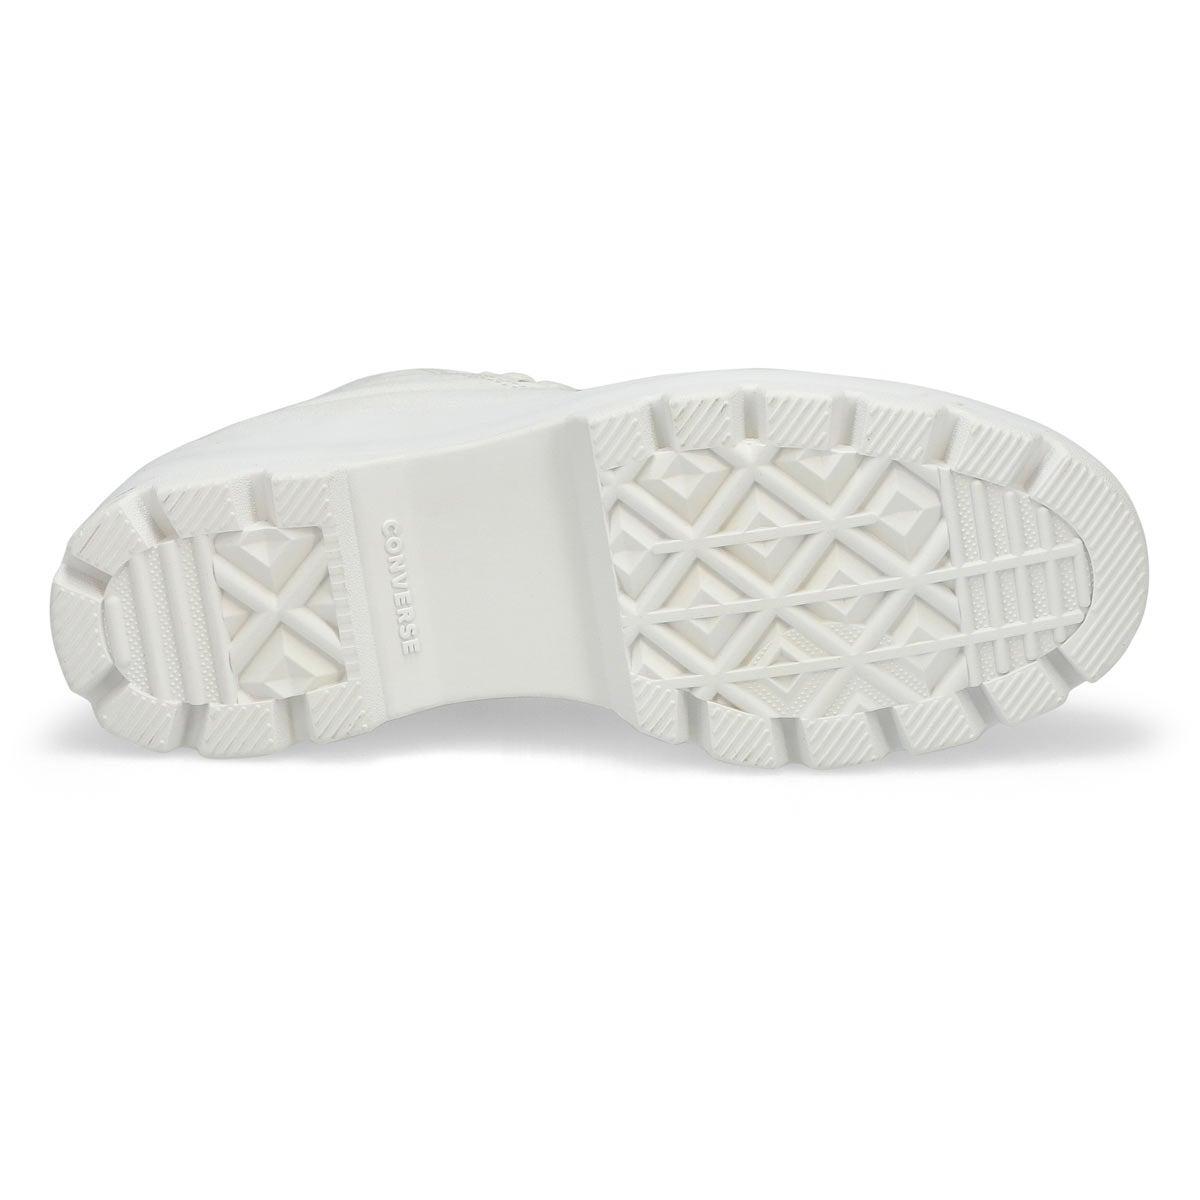 Women's All Star Lugged Hi Top Sneaker - White